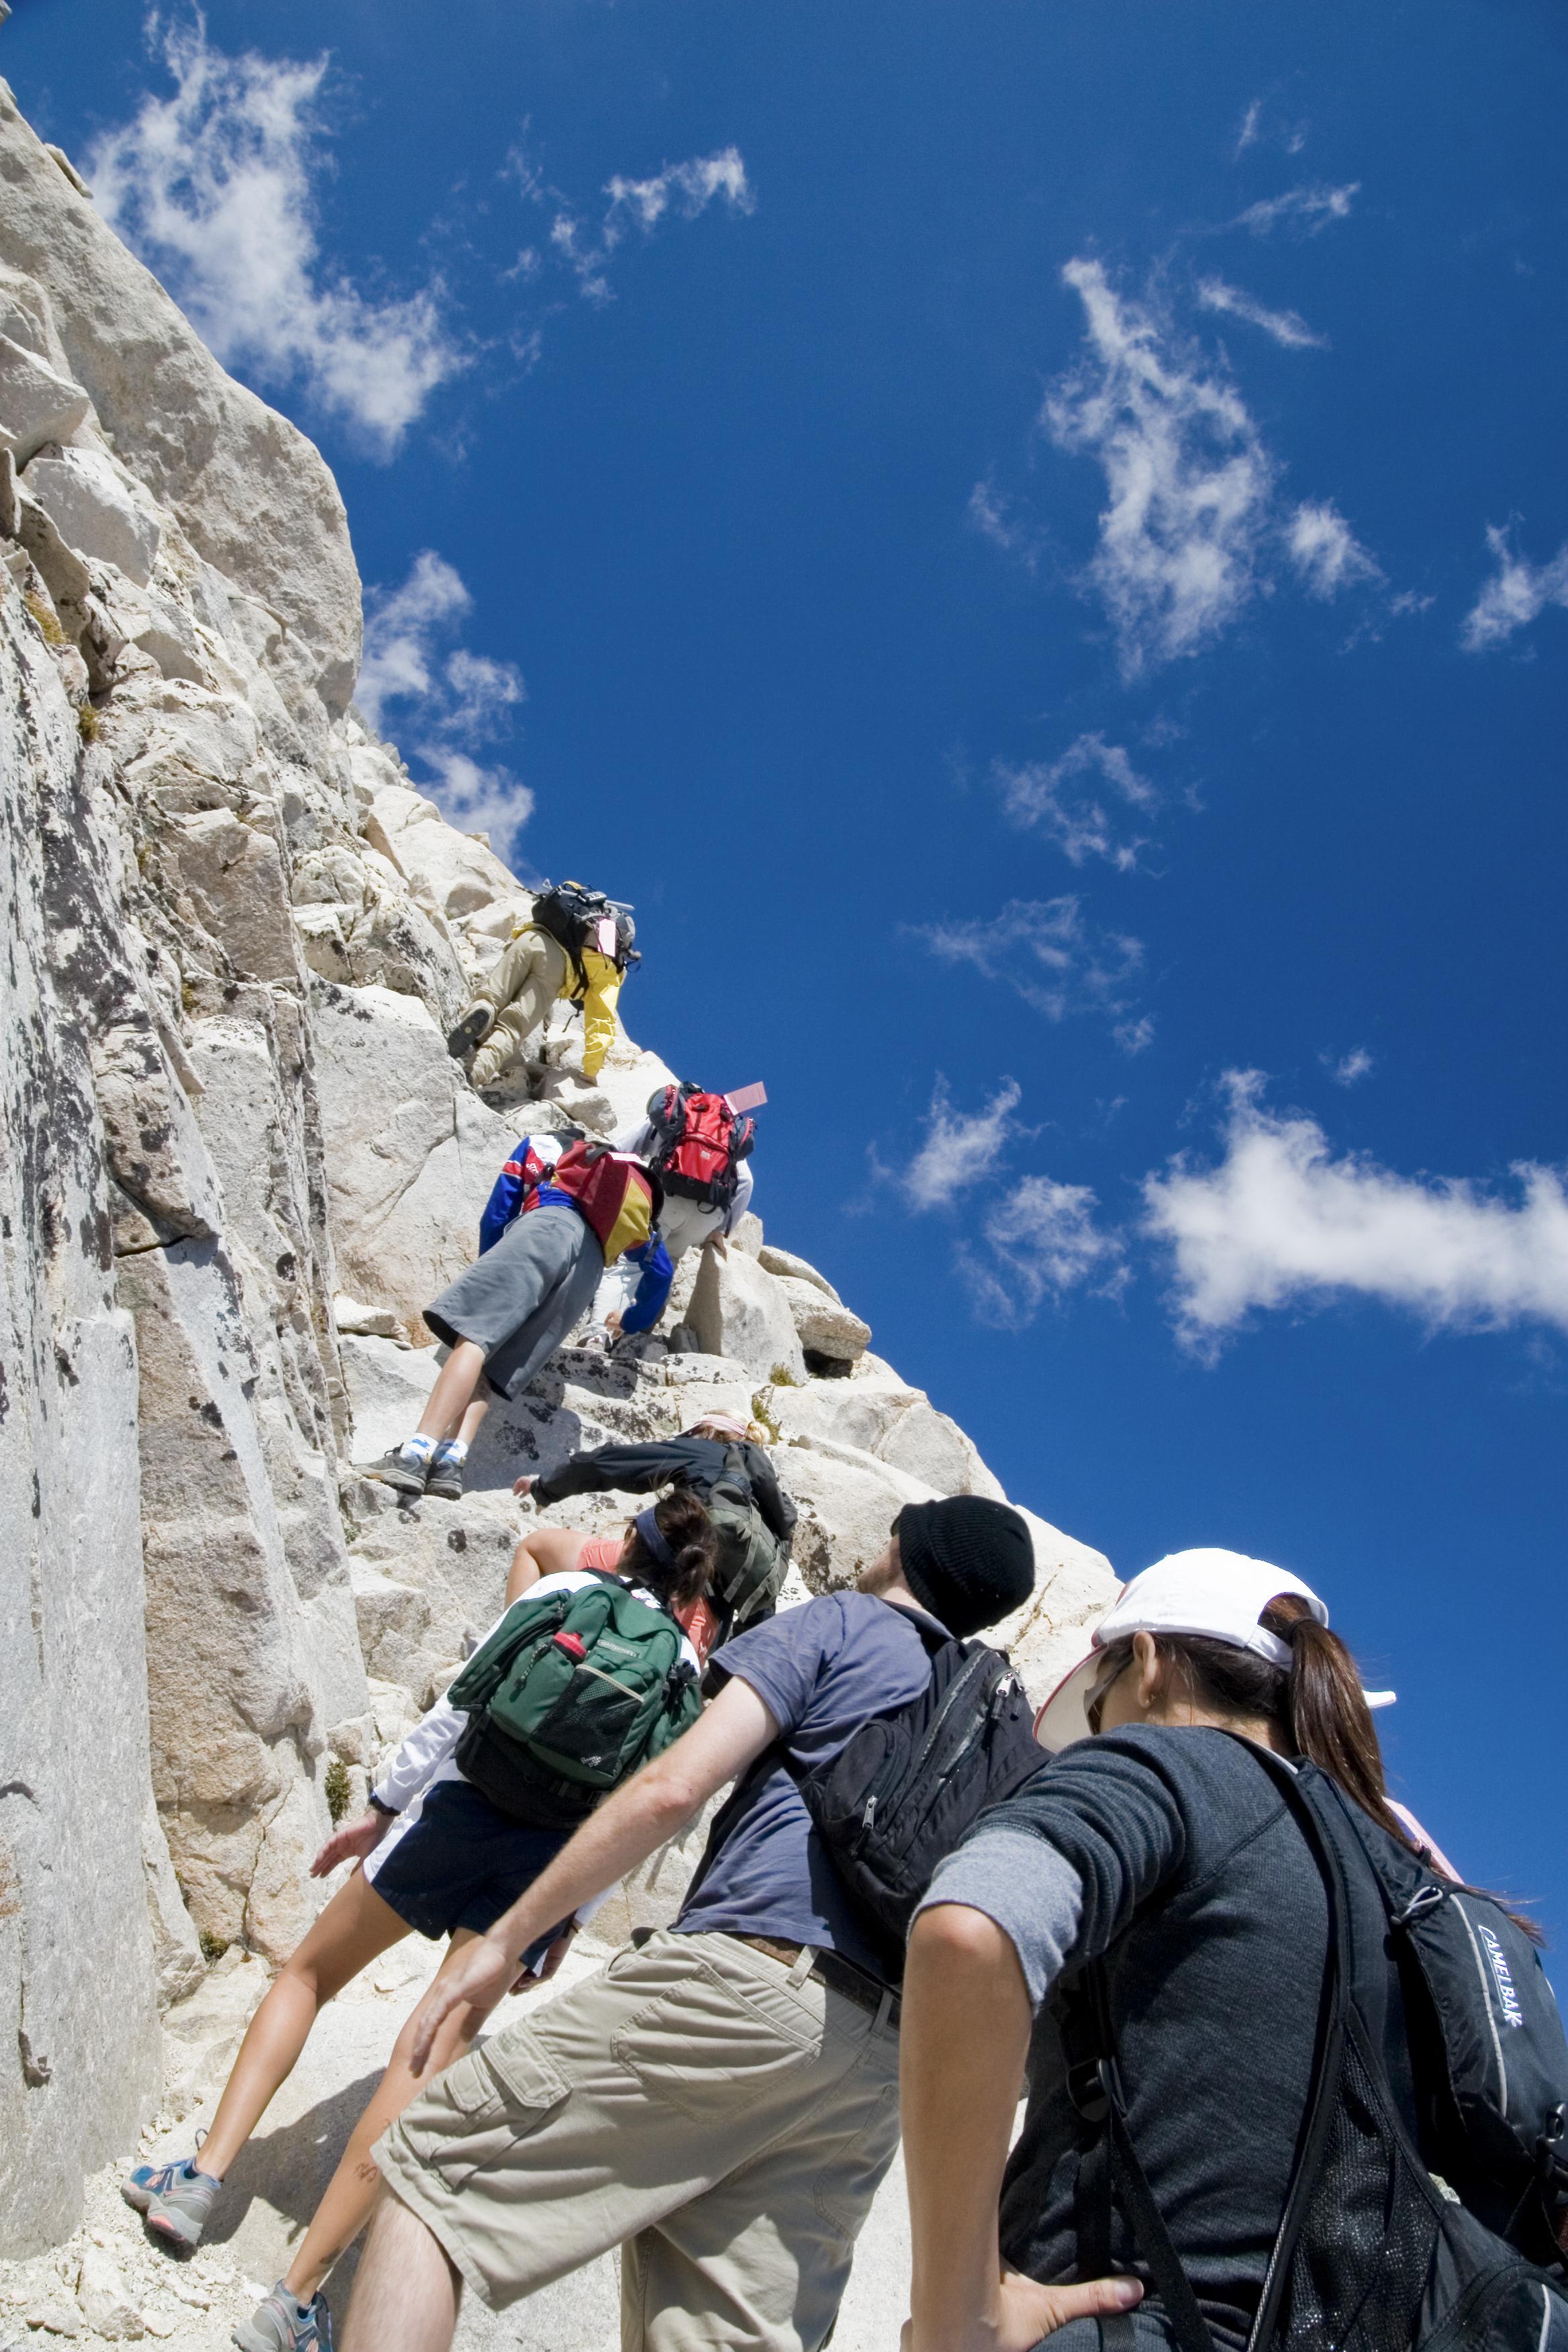 chrissihernandez-california-mount-whitney-hike (8)copy.jpg